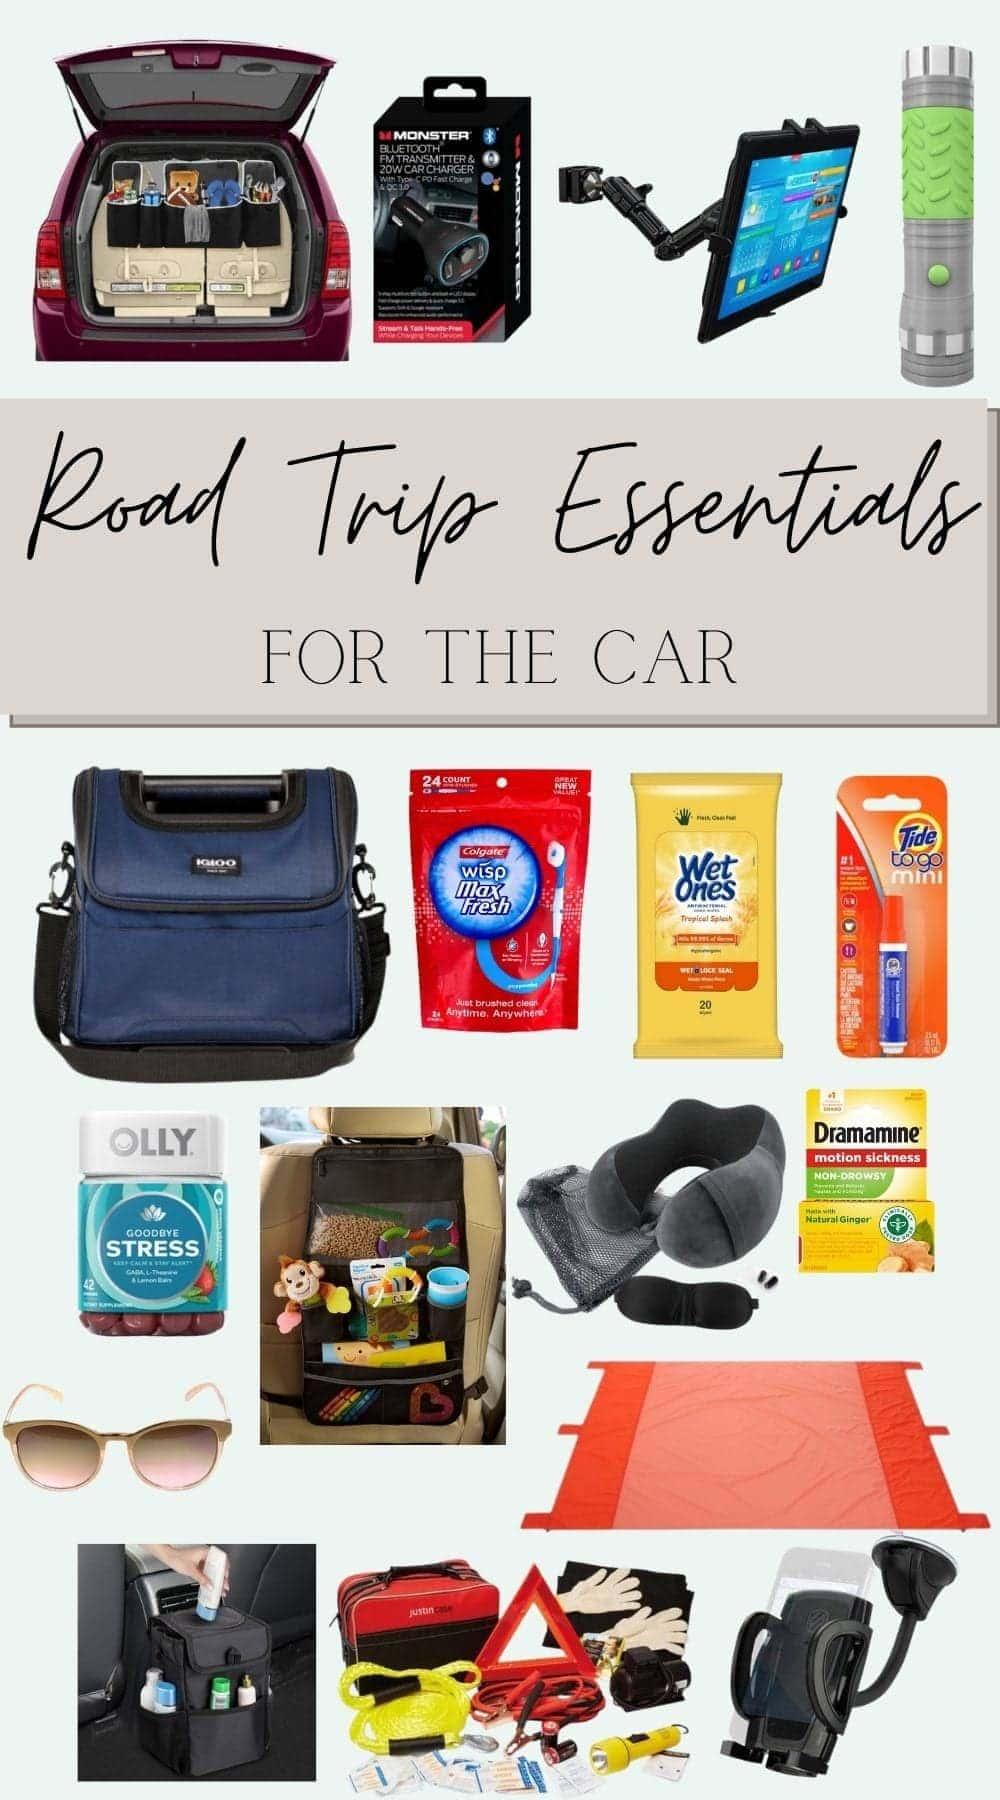 Road trip essentials for the car